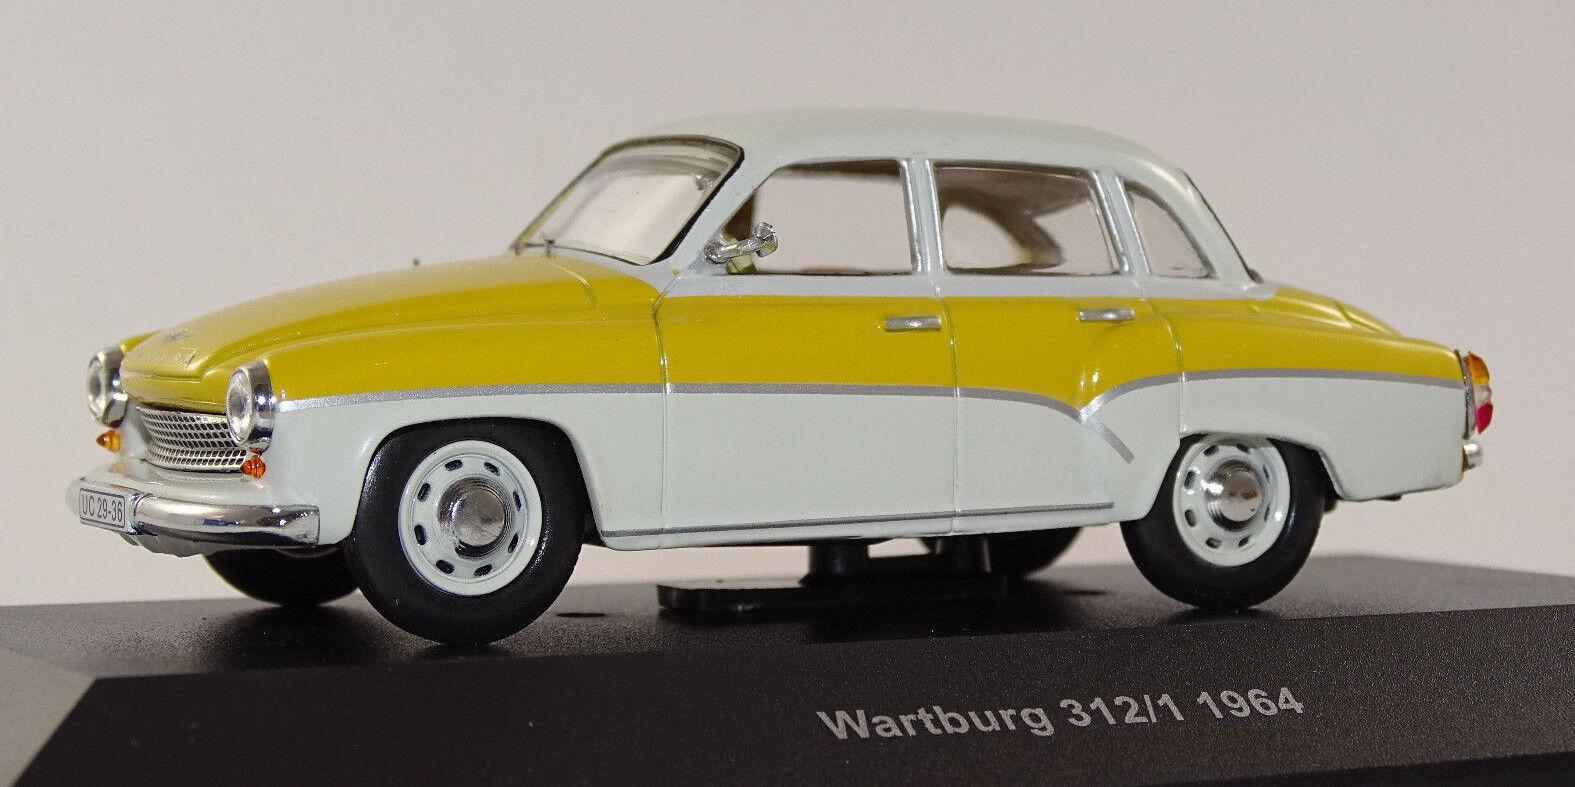 CARS & CO ccc072 Wartburg 3121 1 1964 neuf 1 43